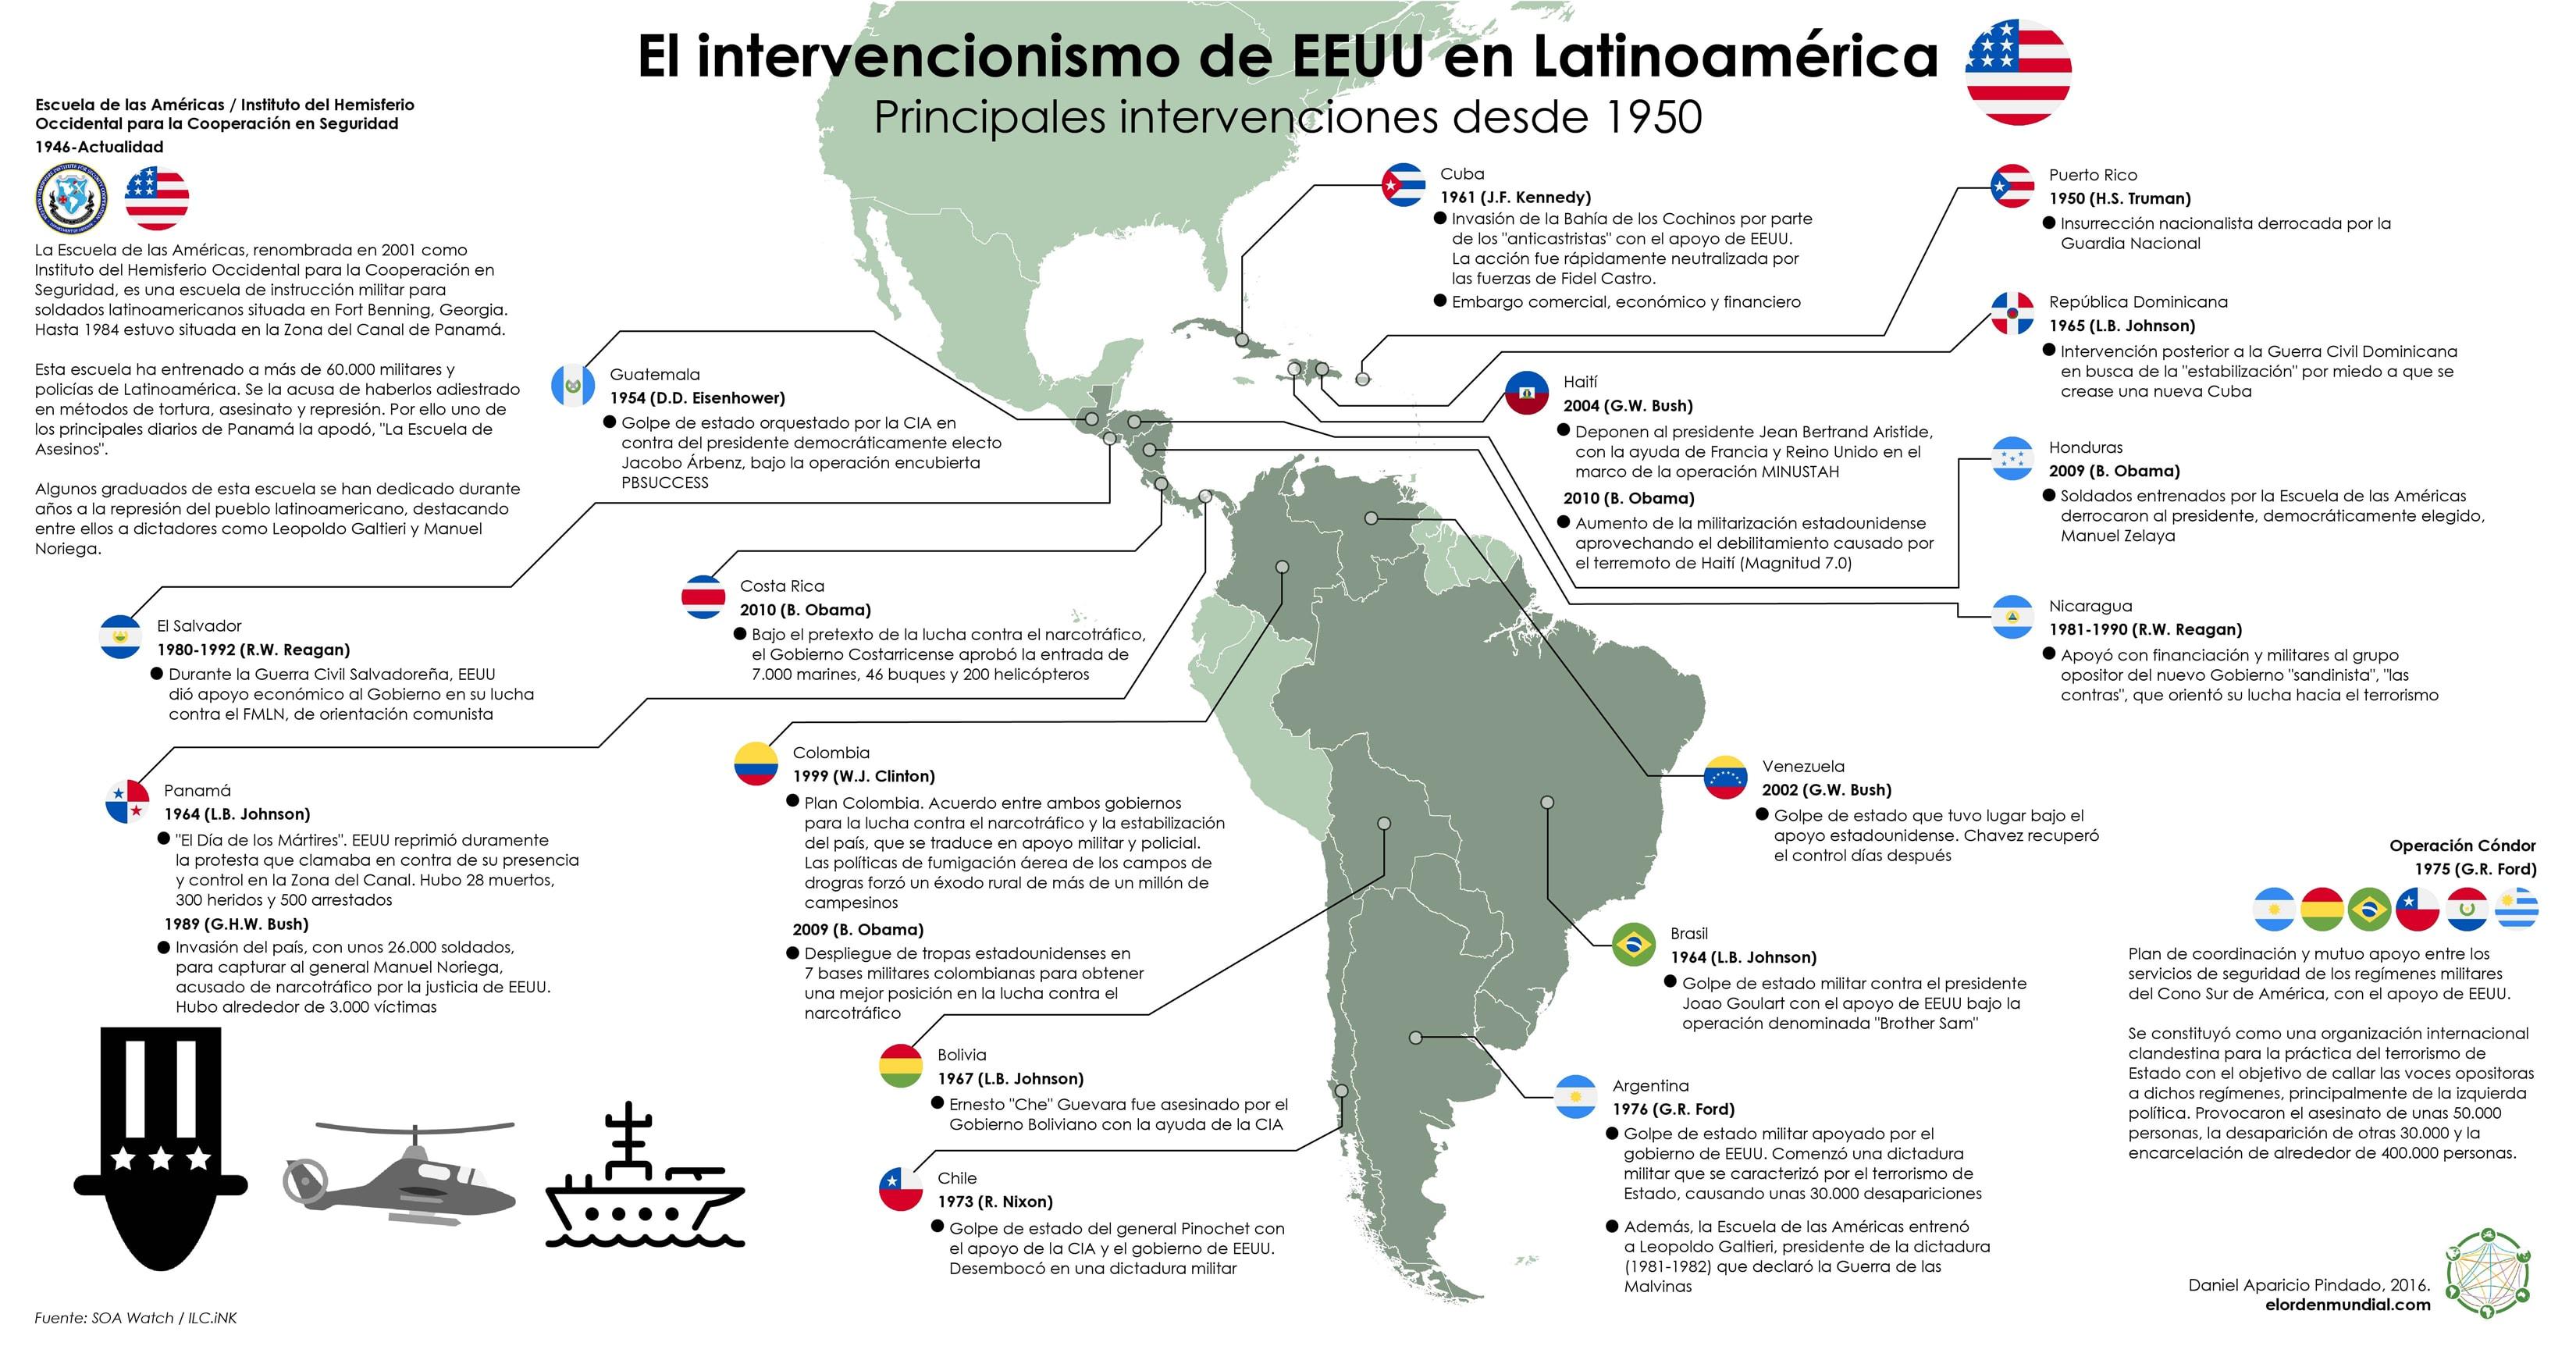 EE. UU. en Latinoamérica